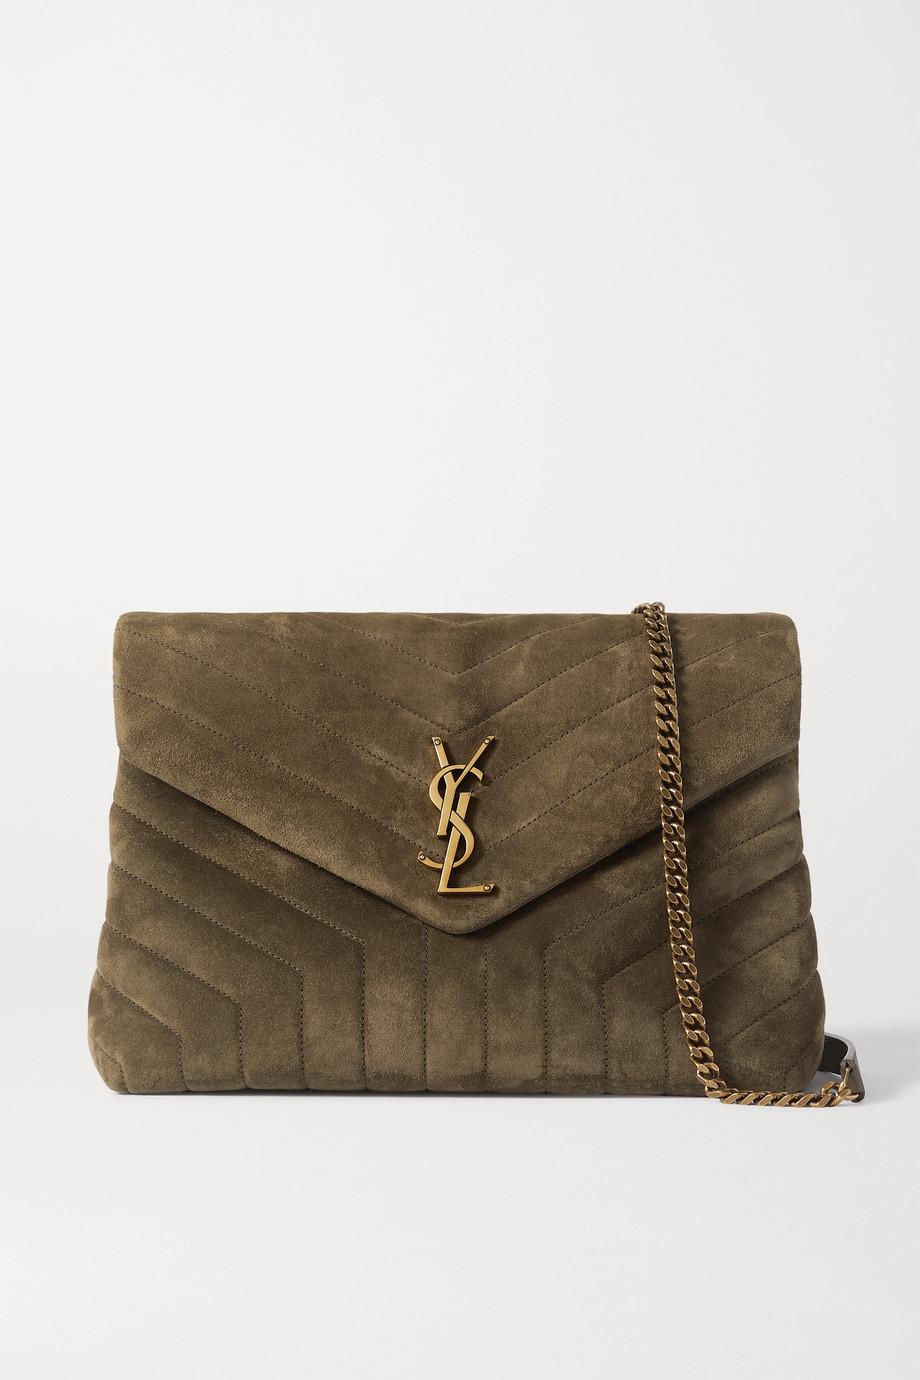 SAINT LAURENT Loulou medium quilted suede shoulder bag